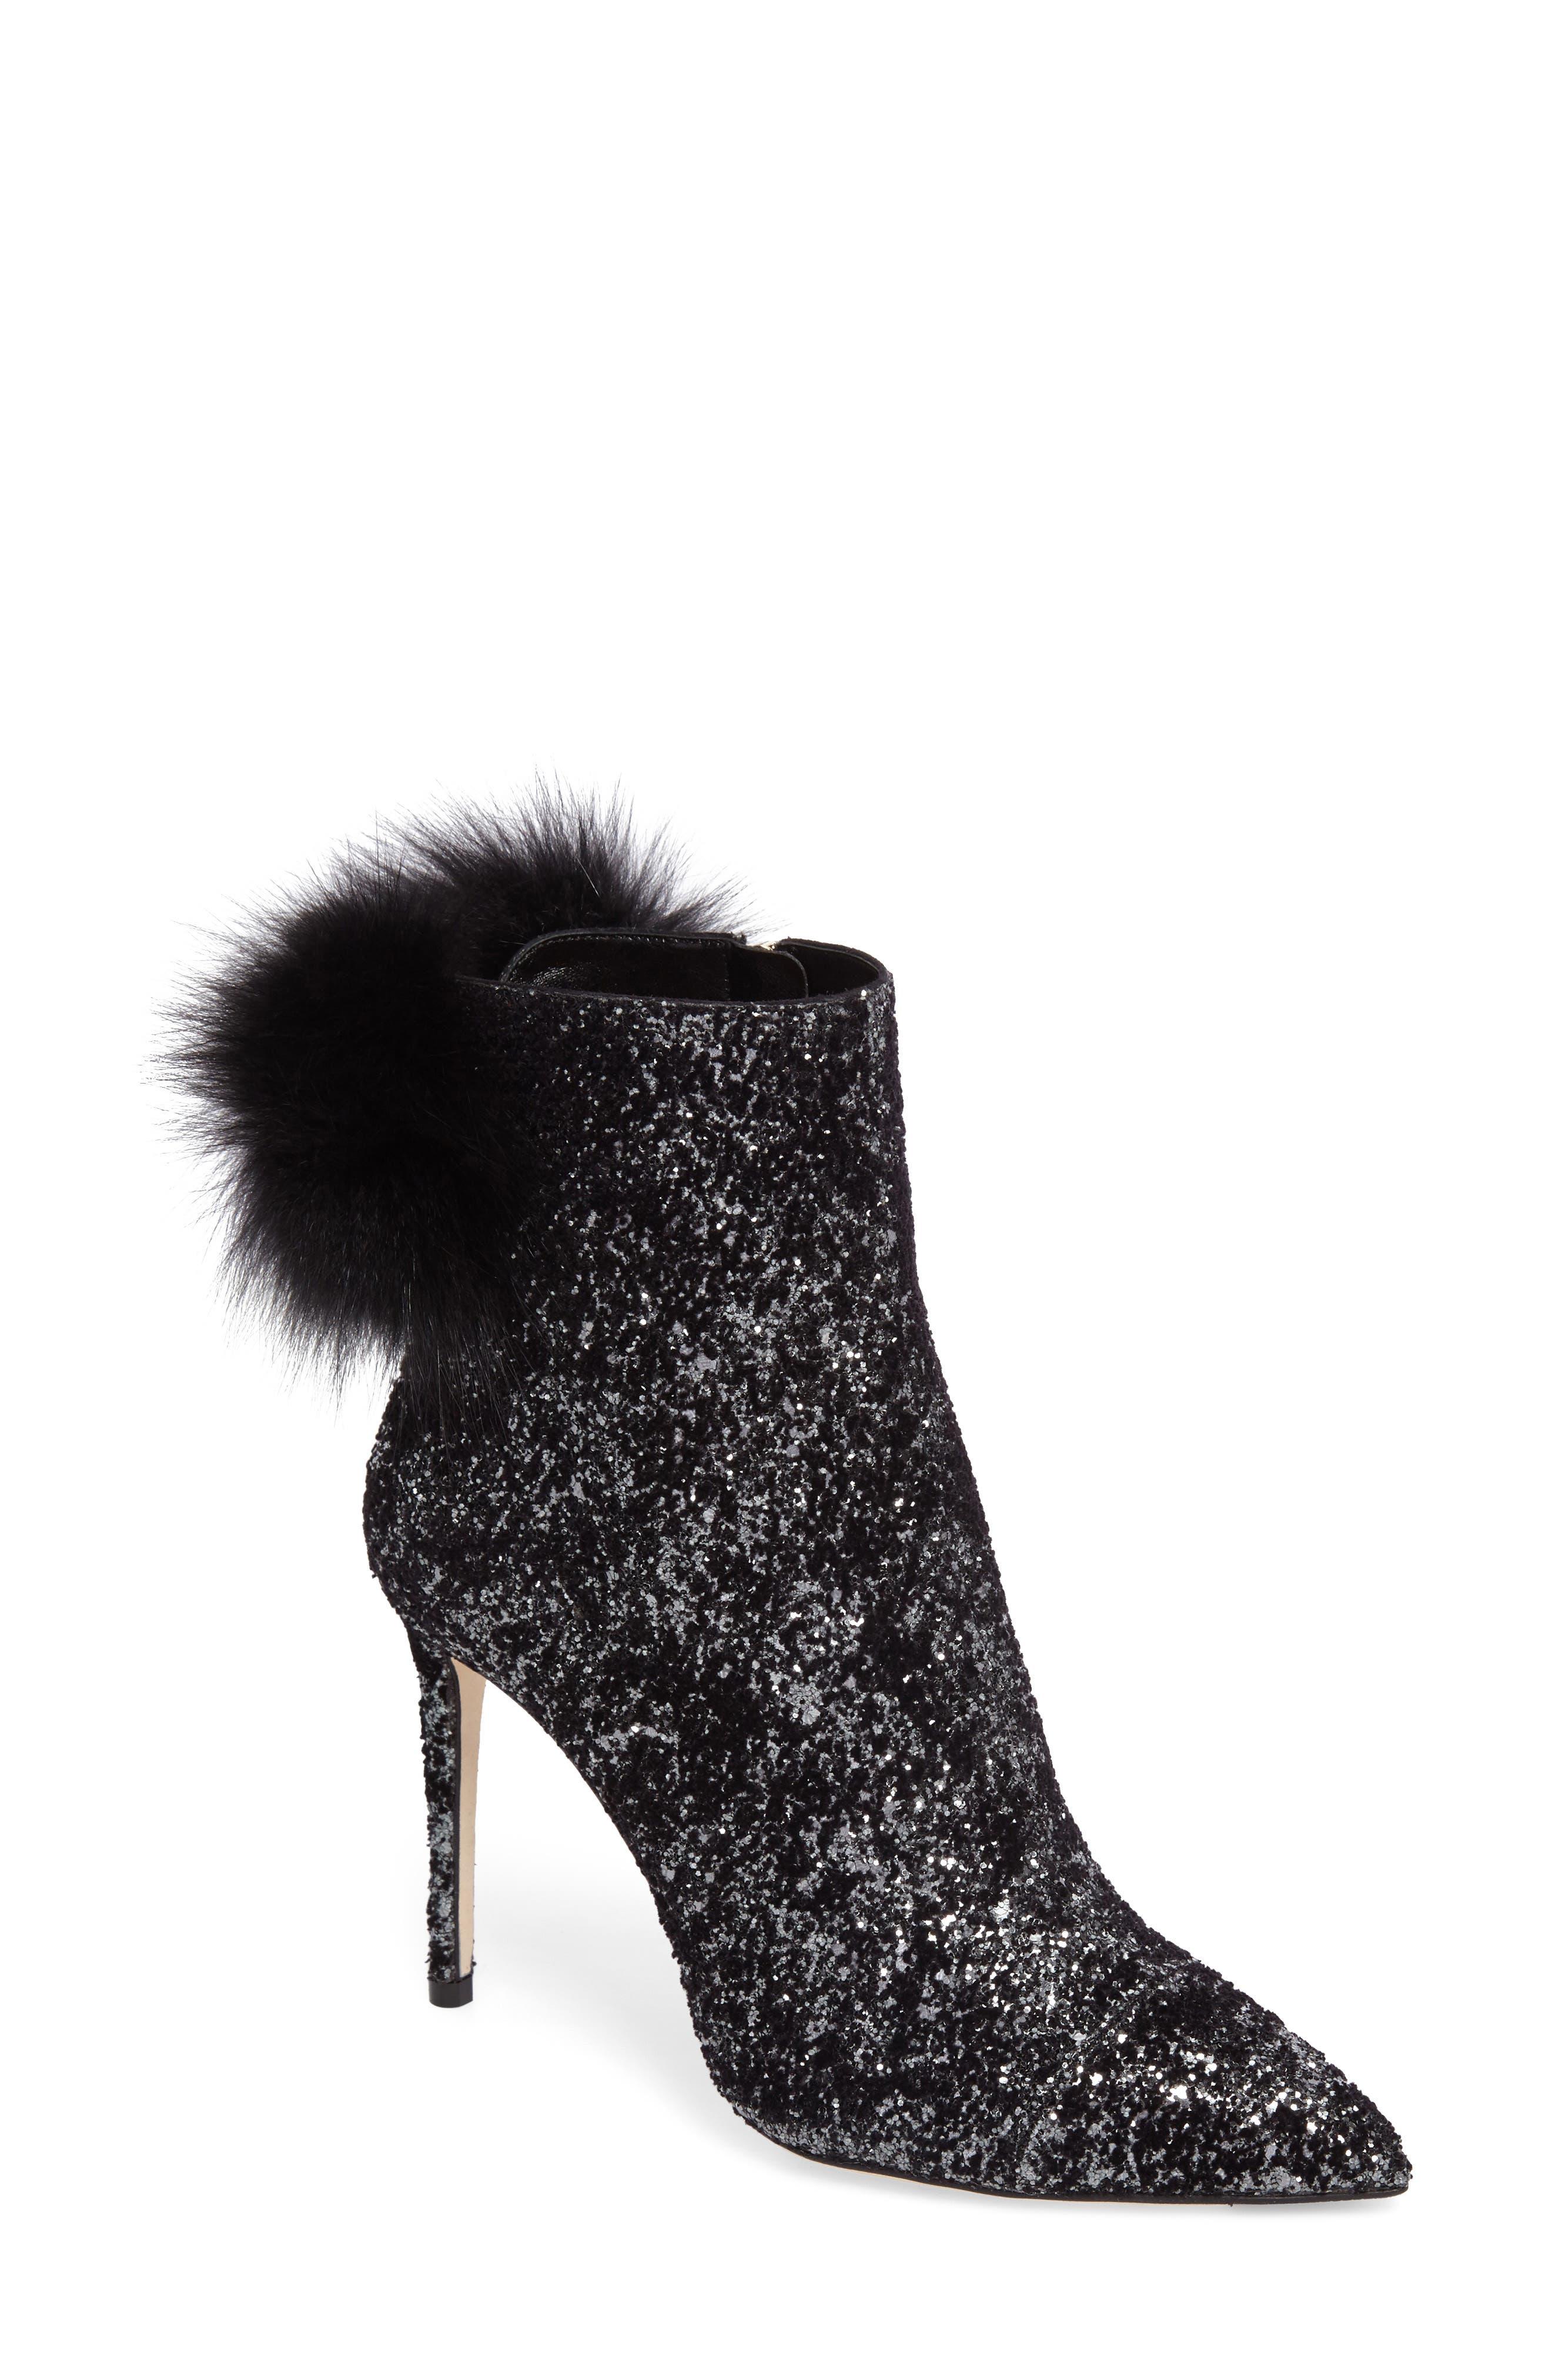 Tesler Genuine Fox Fur Bootie,                         Main,                         color, Anthracite/ Black/ Black